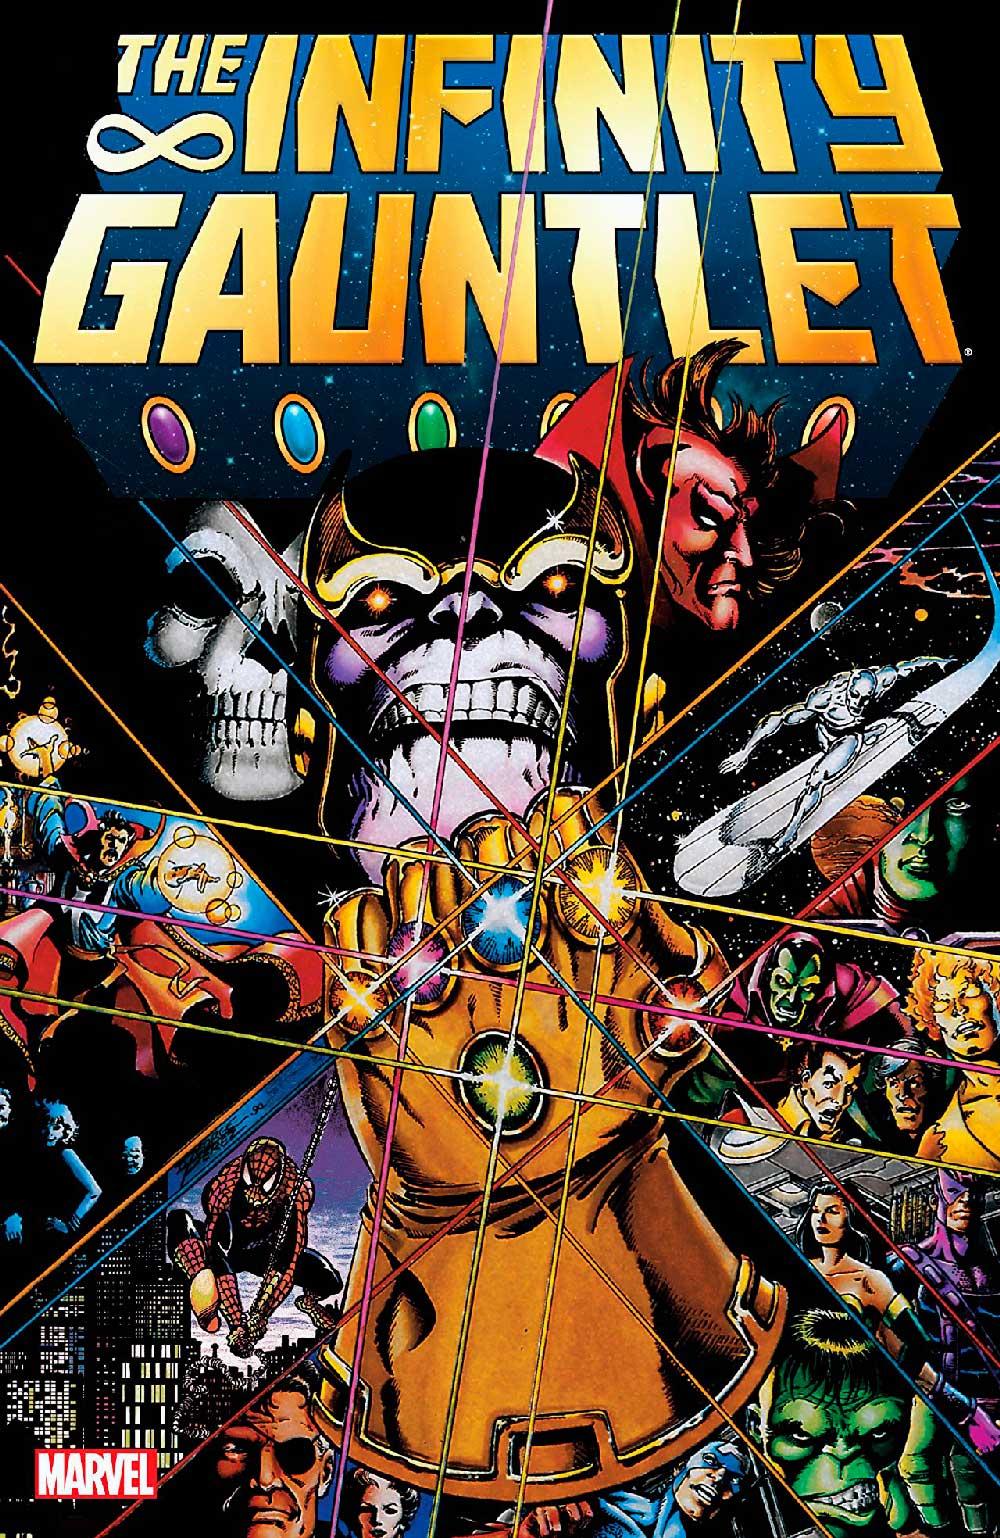 Marvel Comics,The Infinity Gauntlet, комікси на українській, комікси марвел